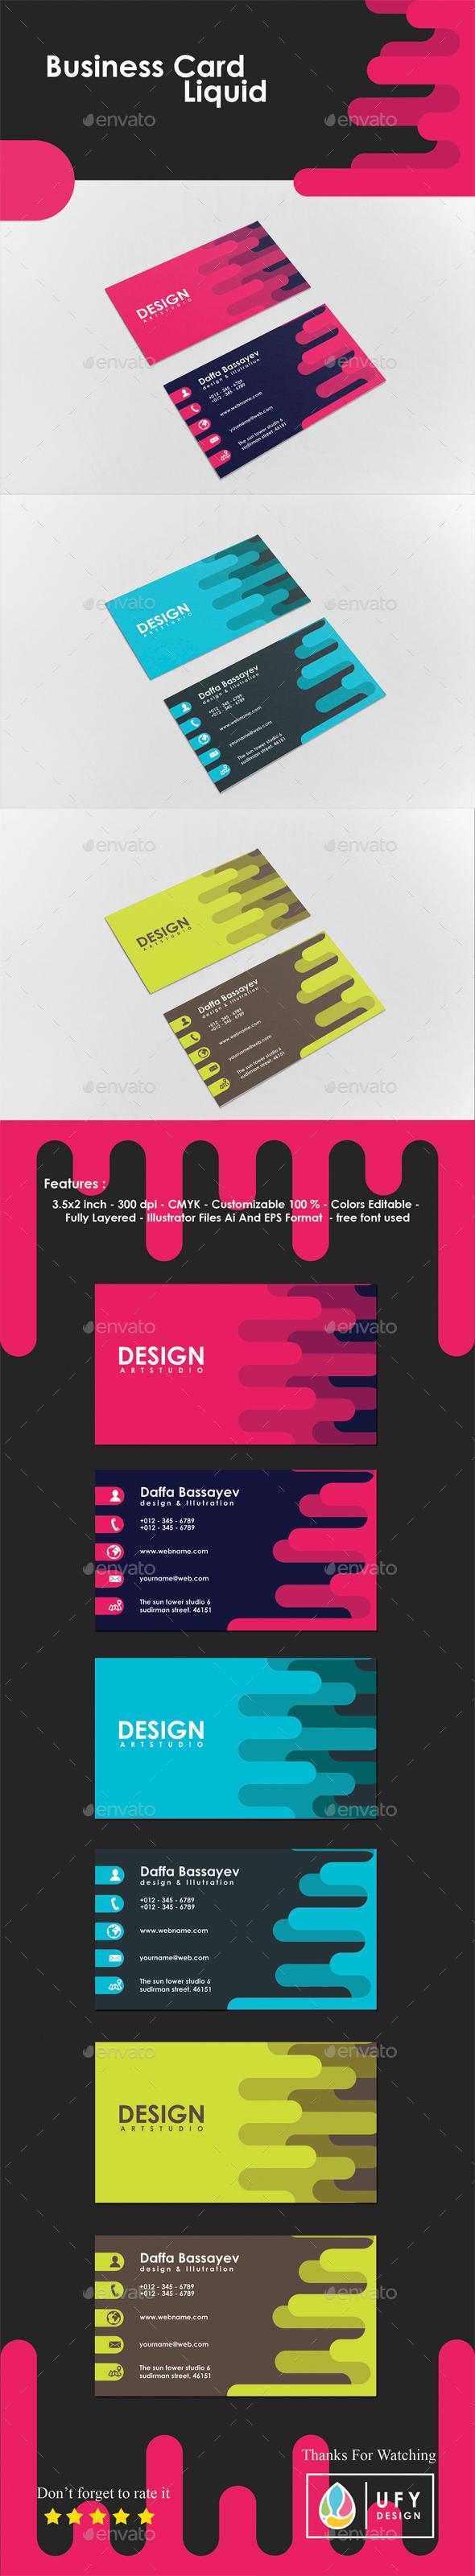 Business Card - Liquid - Business Cards Print Templates